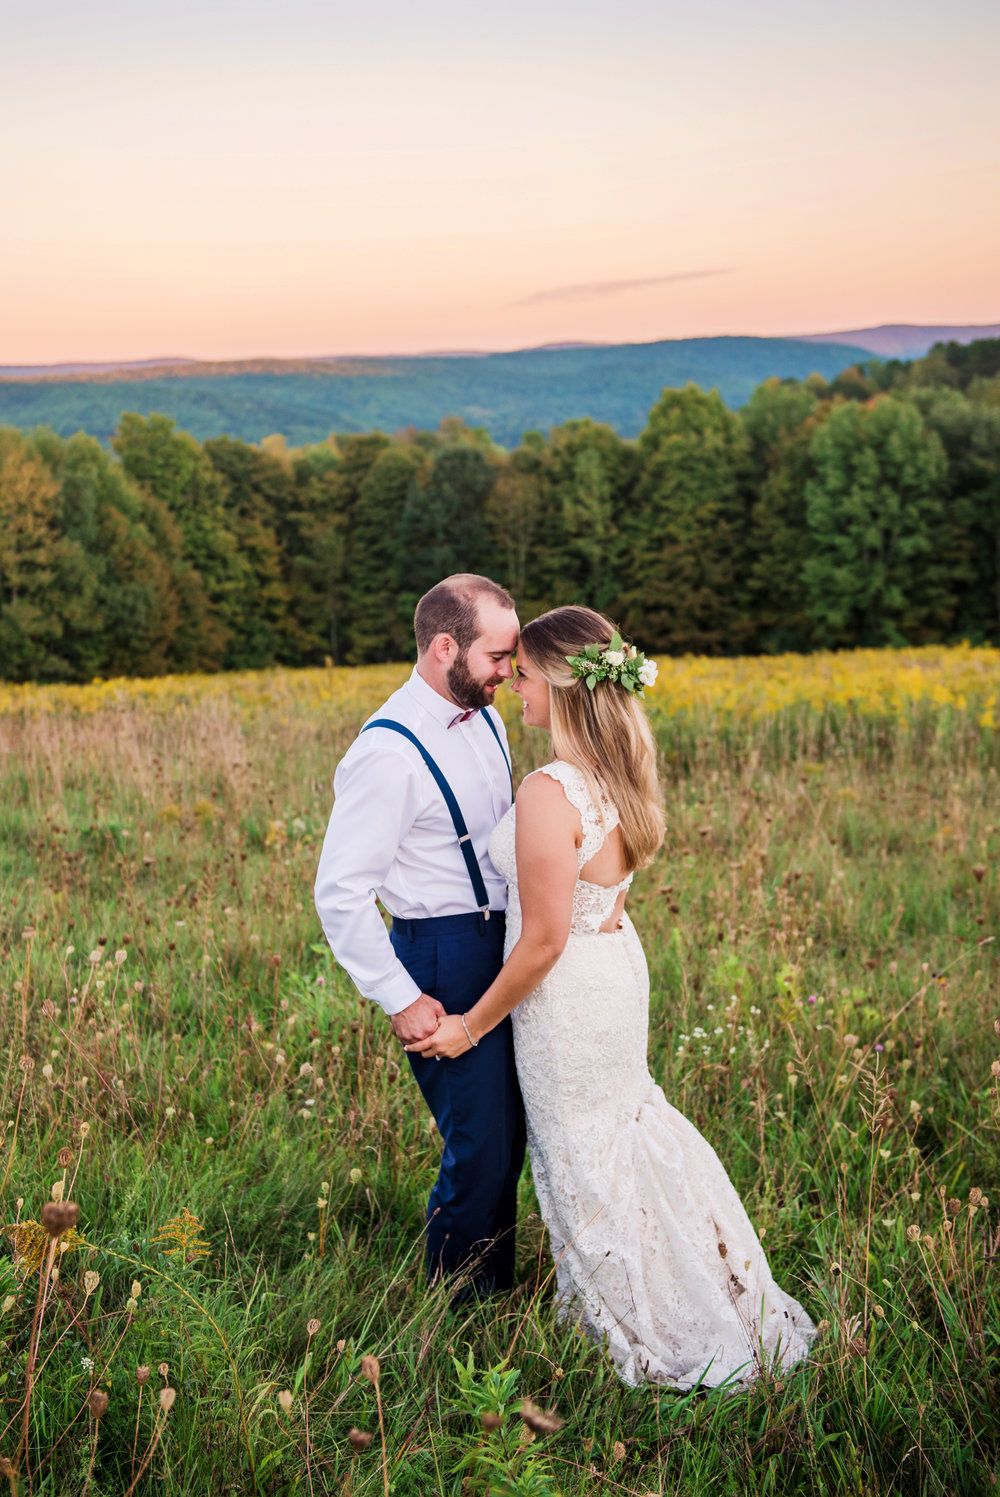 JILL_STUDIO_Wedding_JILL_STUDIO_Rochester_NY_Photographer_23-DSC_5887.jpg